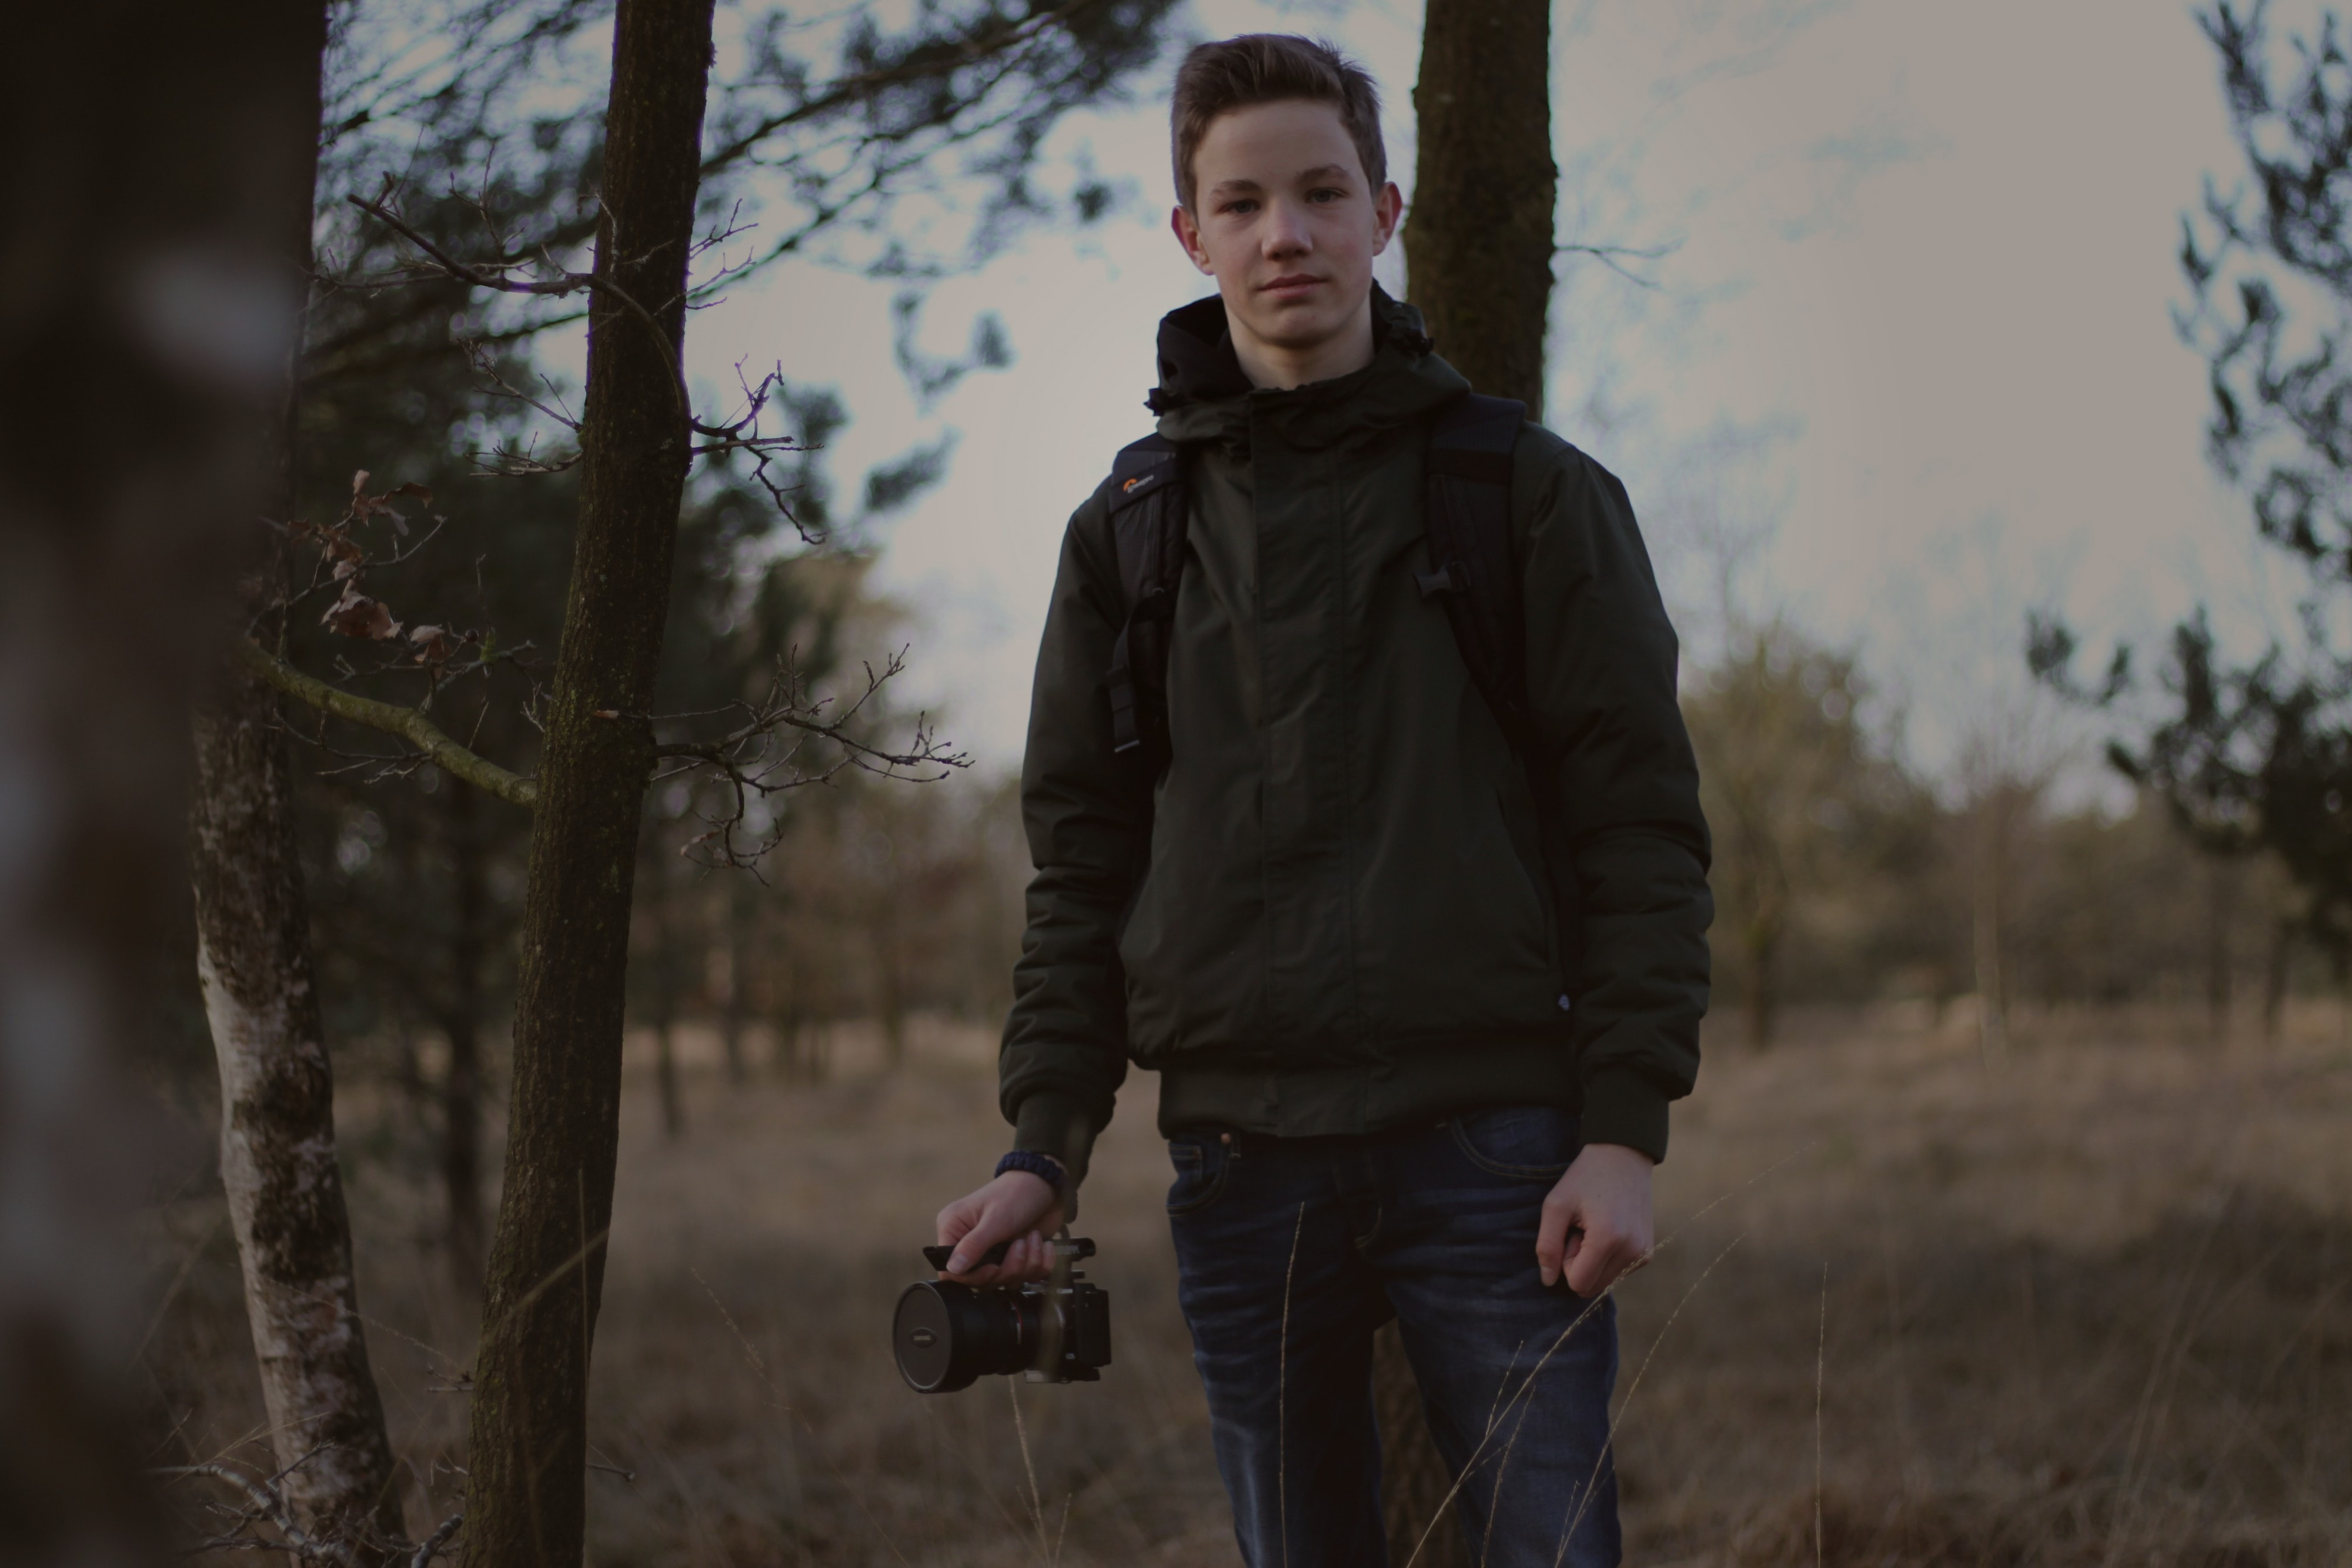 Go to Bram Kunnen's profile